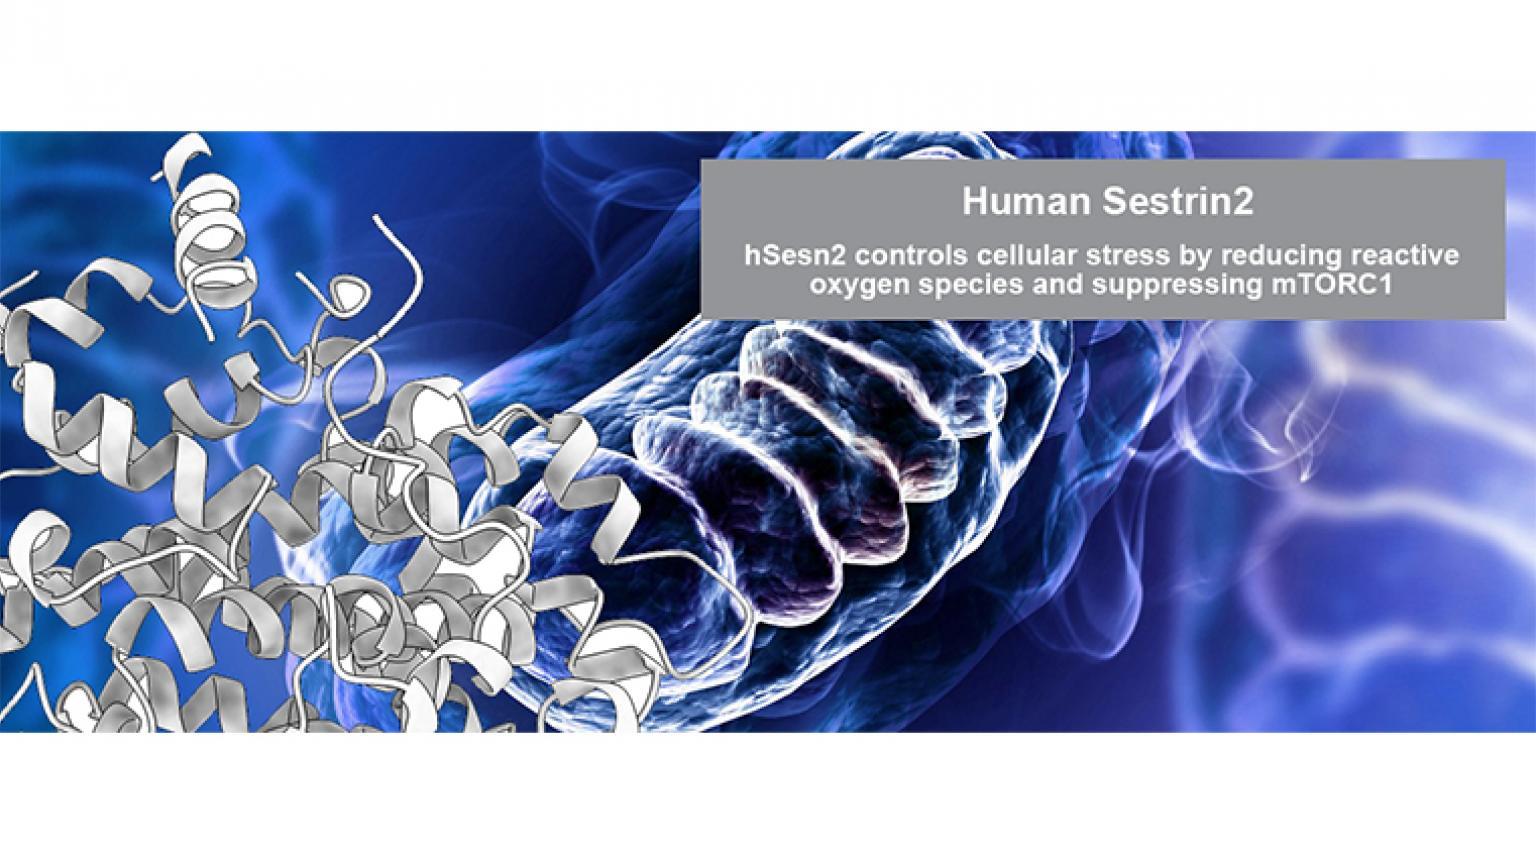 Human Sestrin2